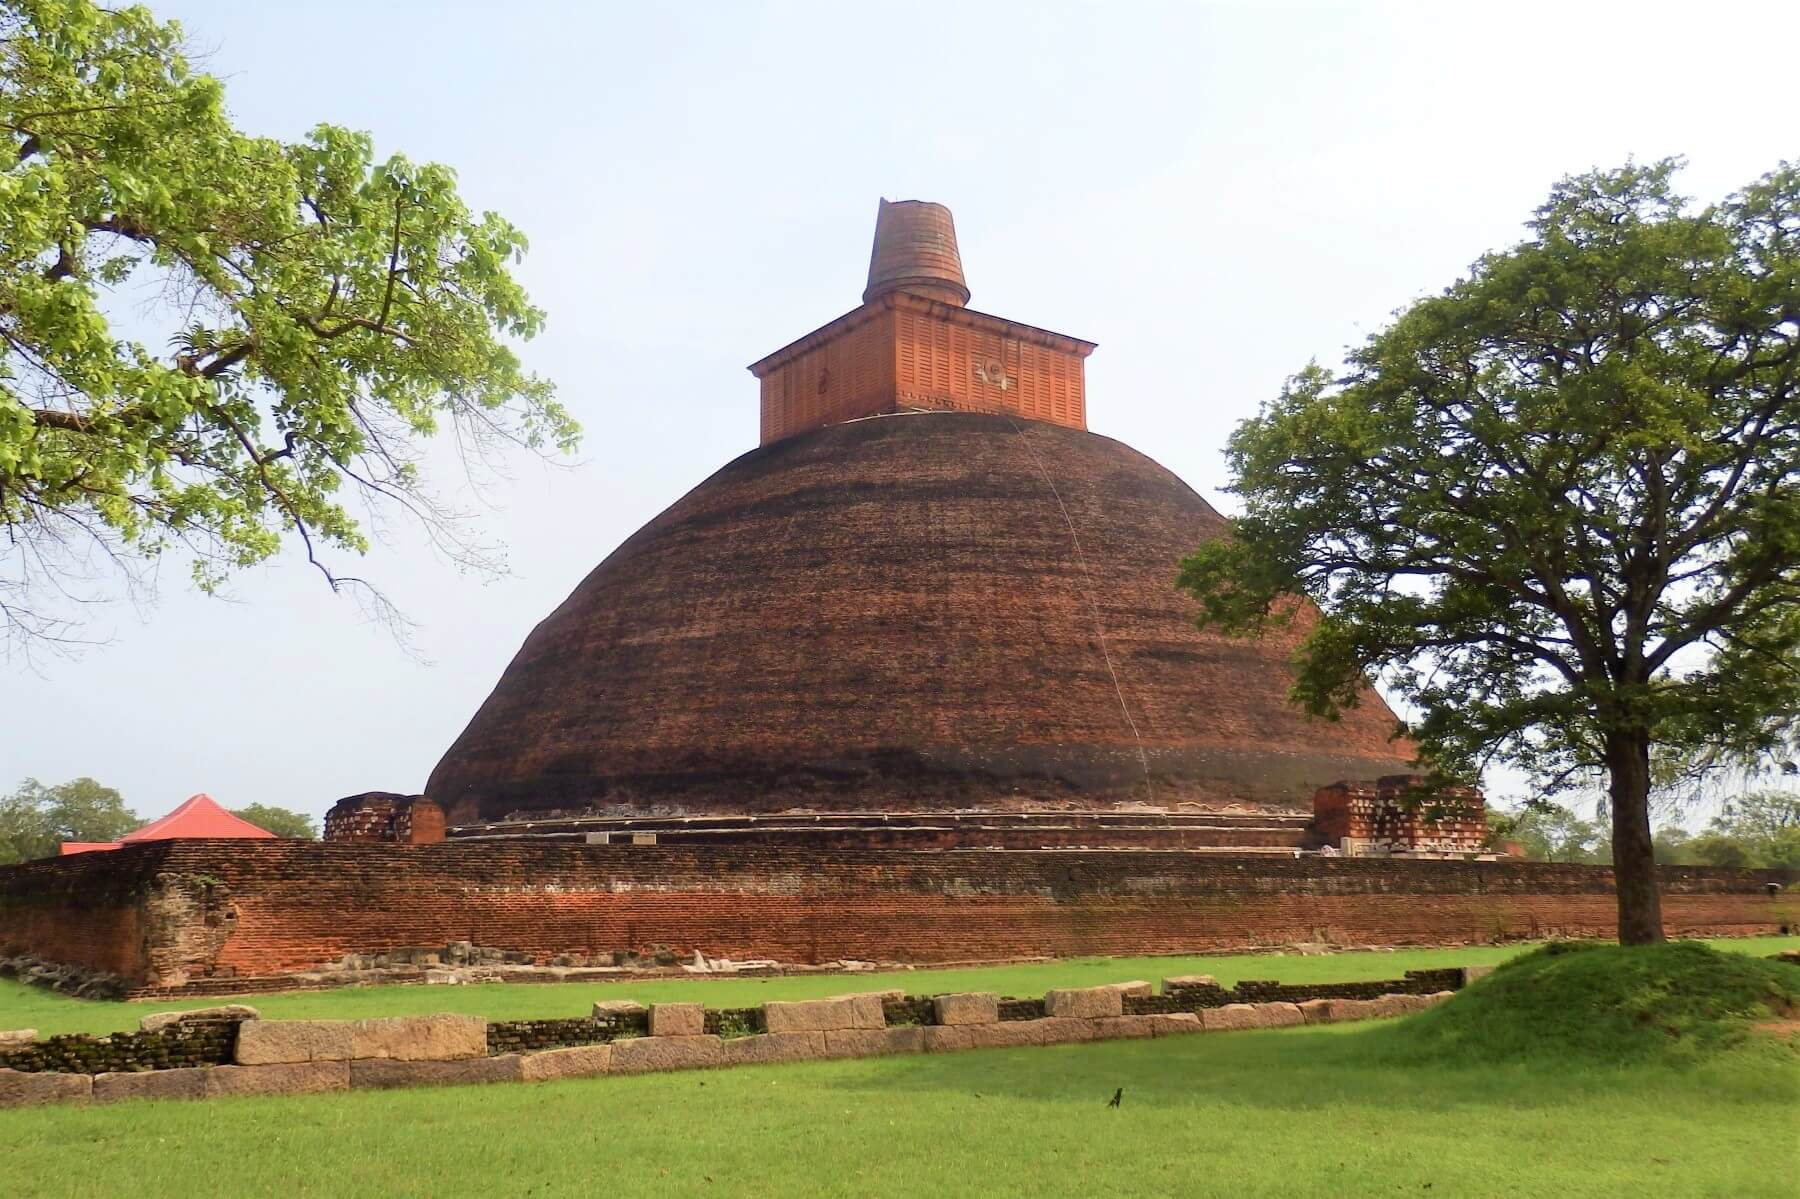 Travel guide of History to Anuradhapura in Sri Lanka